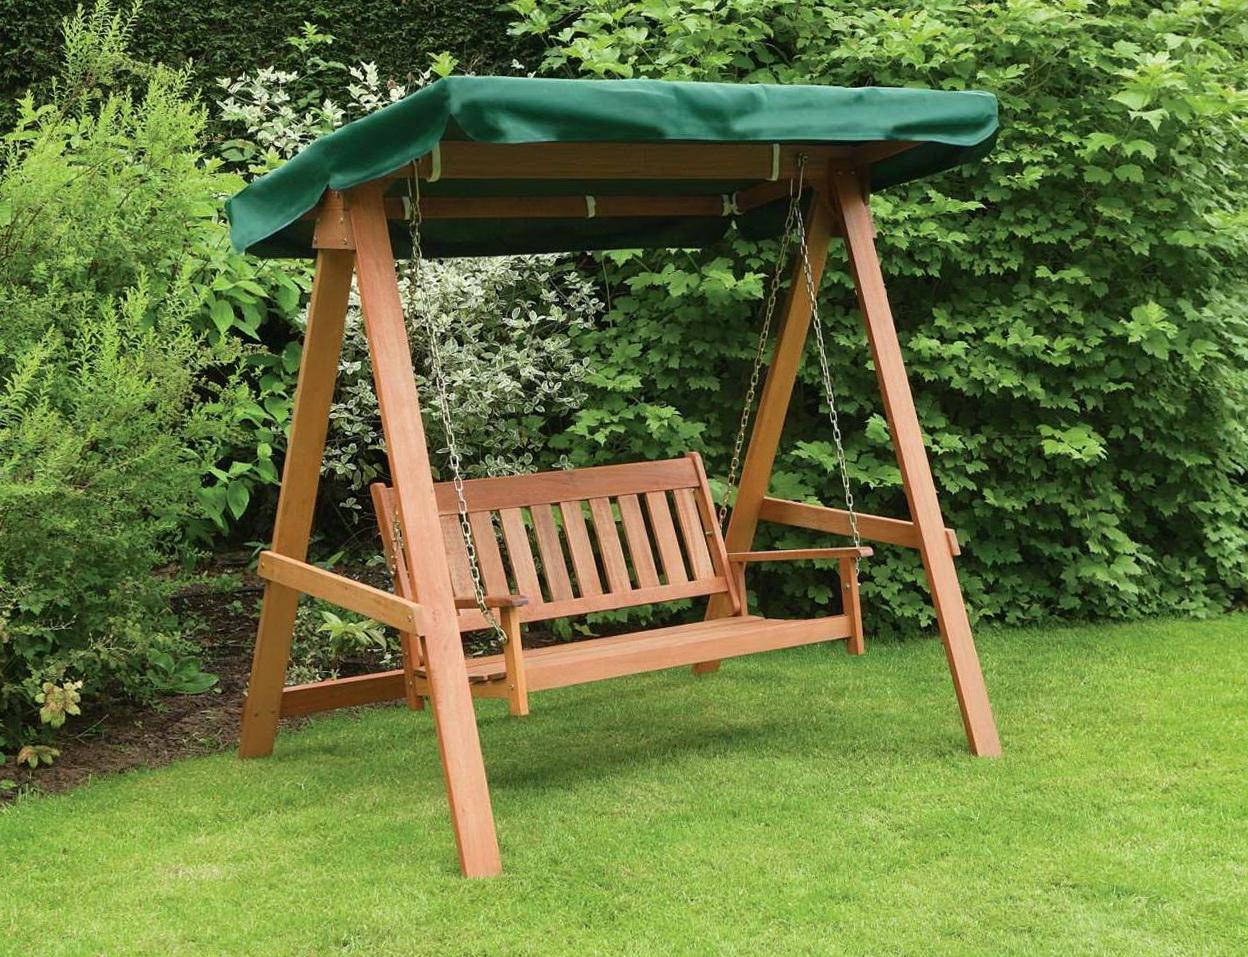 Wood Garden Bench Plans Home Design Ideas